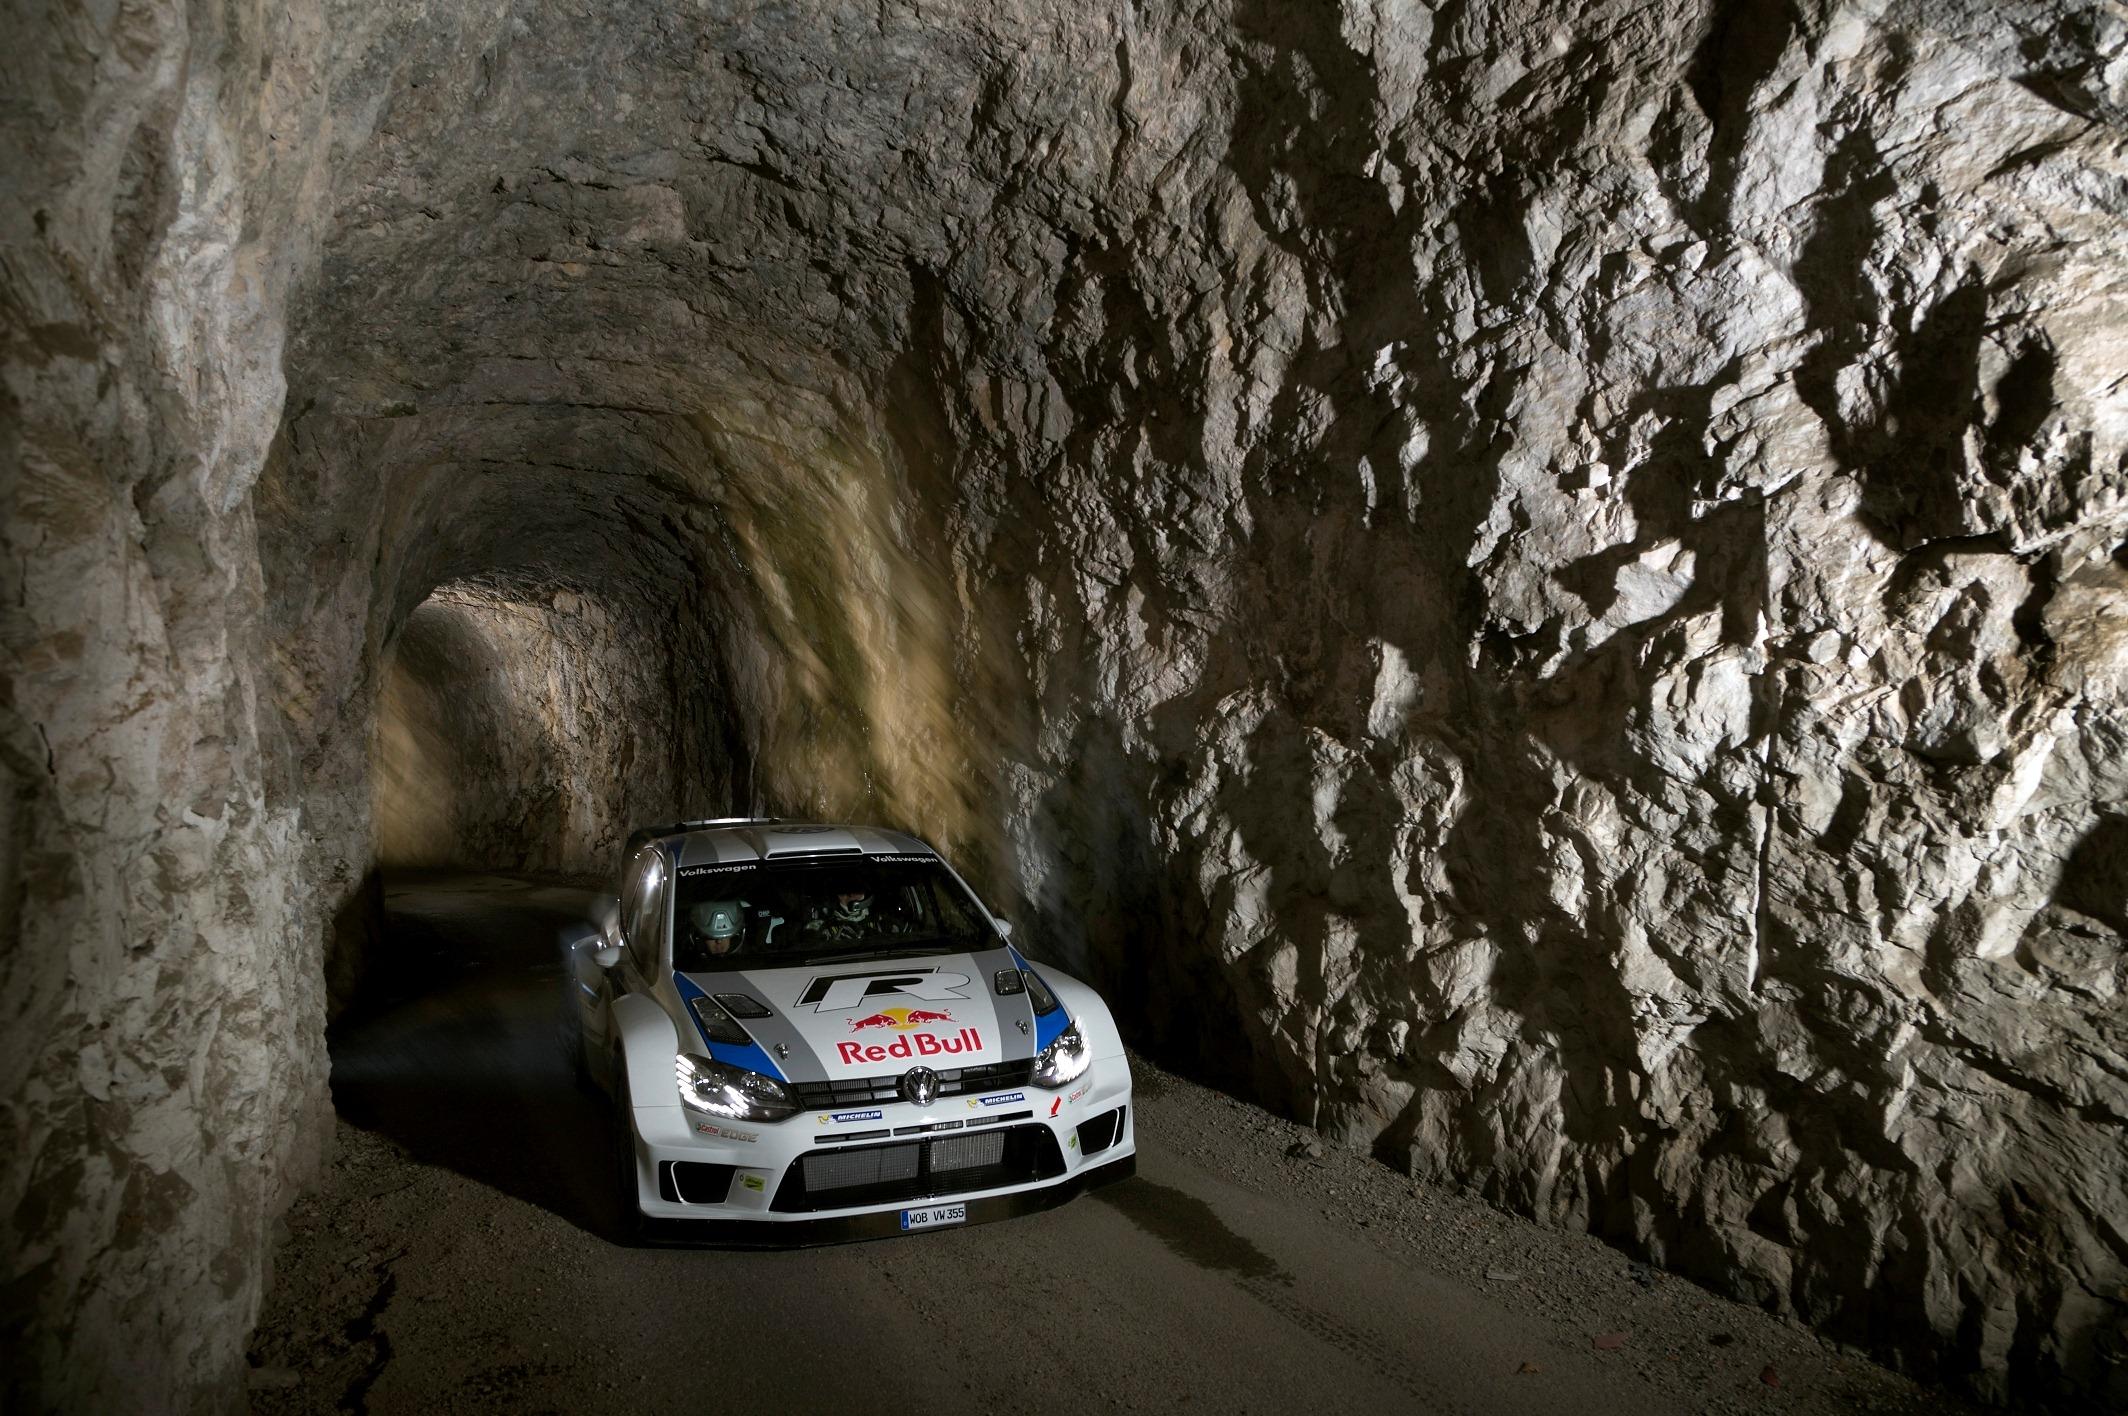 Rally, FIA World Rally Championship, Test